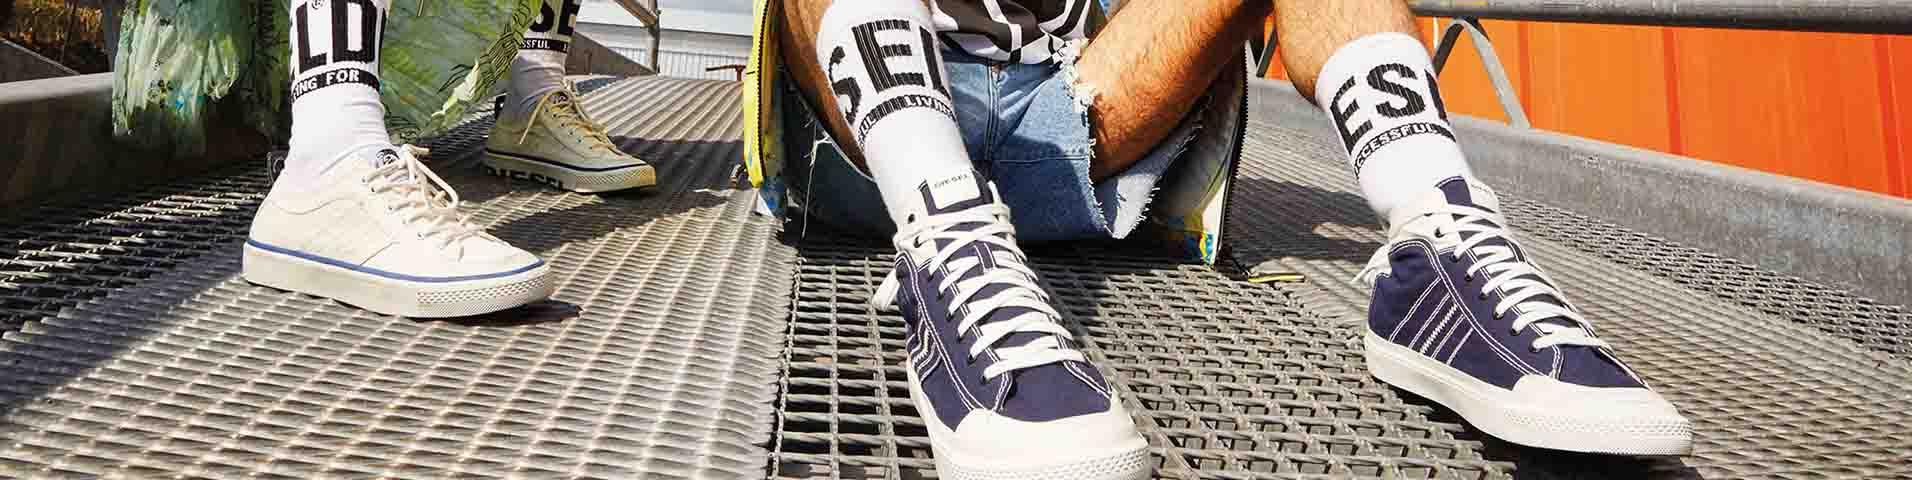 418552db96b10 Diesel Men's Trainers | Running Shoes | ZALANDO UK